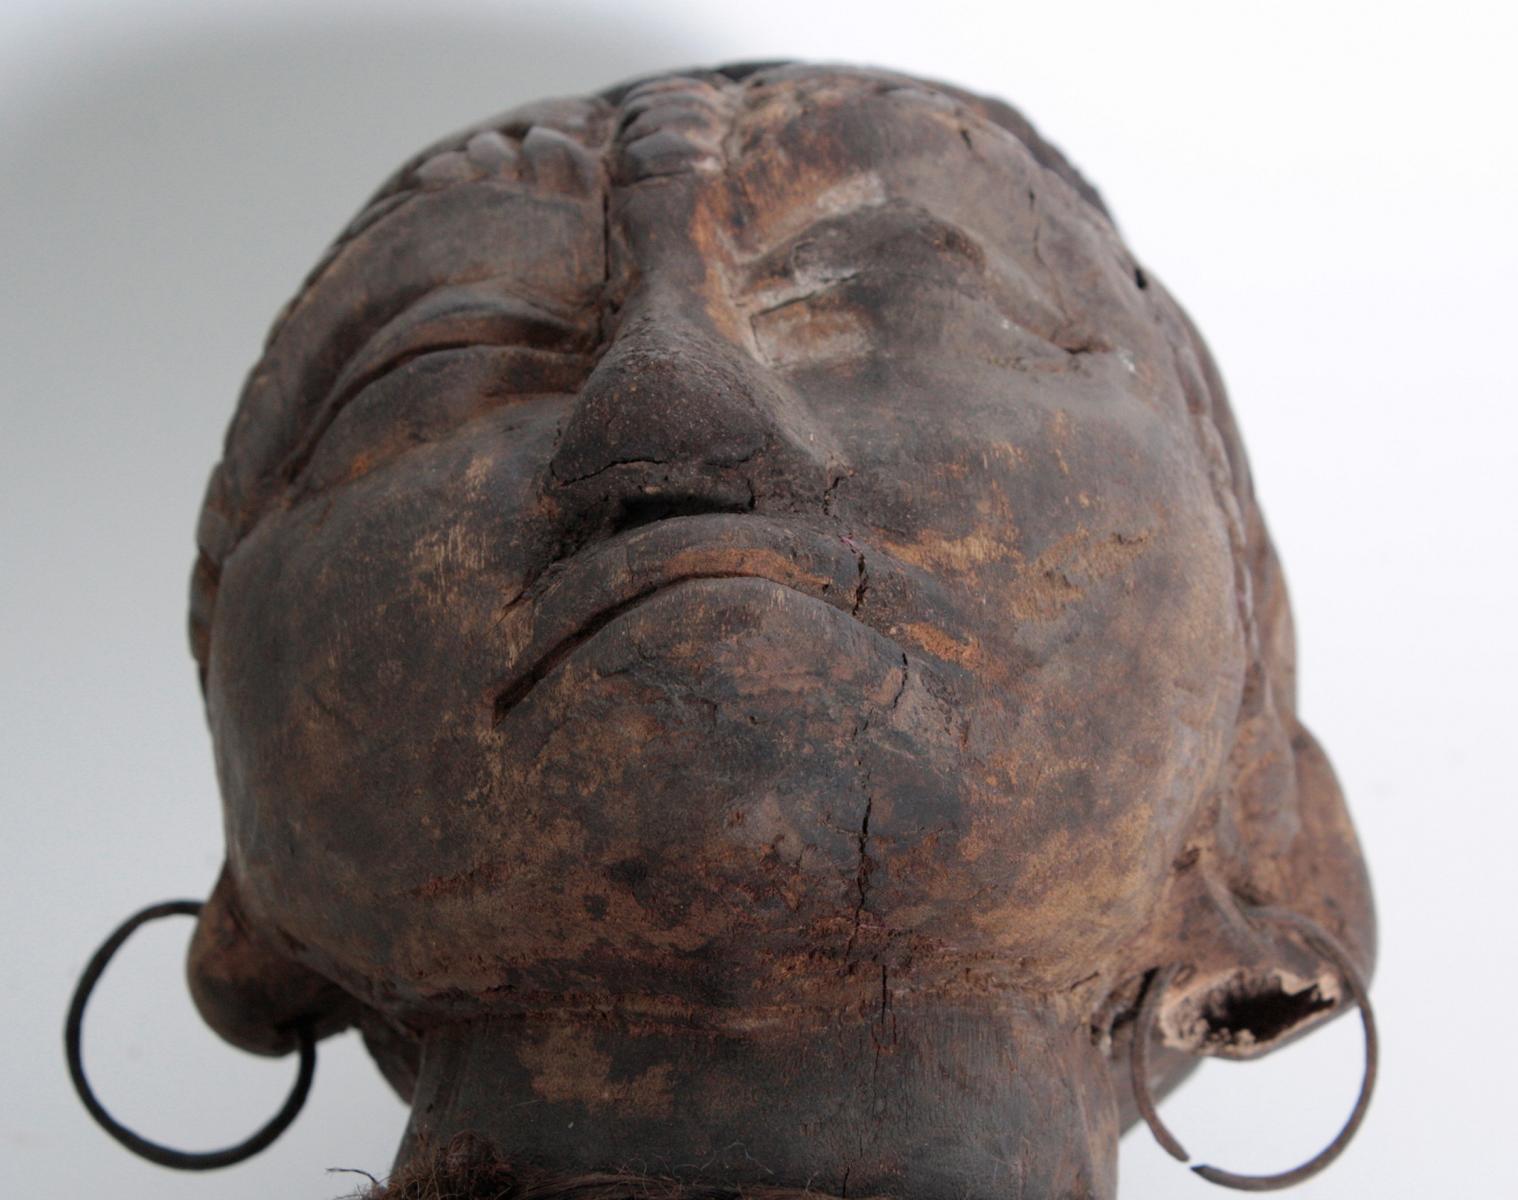 Ältere Ahnen-Figur, Tabwa, D. R. Kongo-13